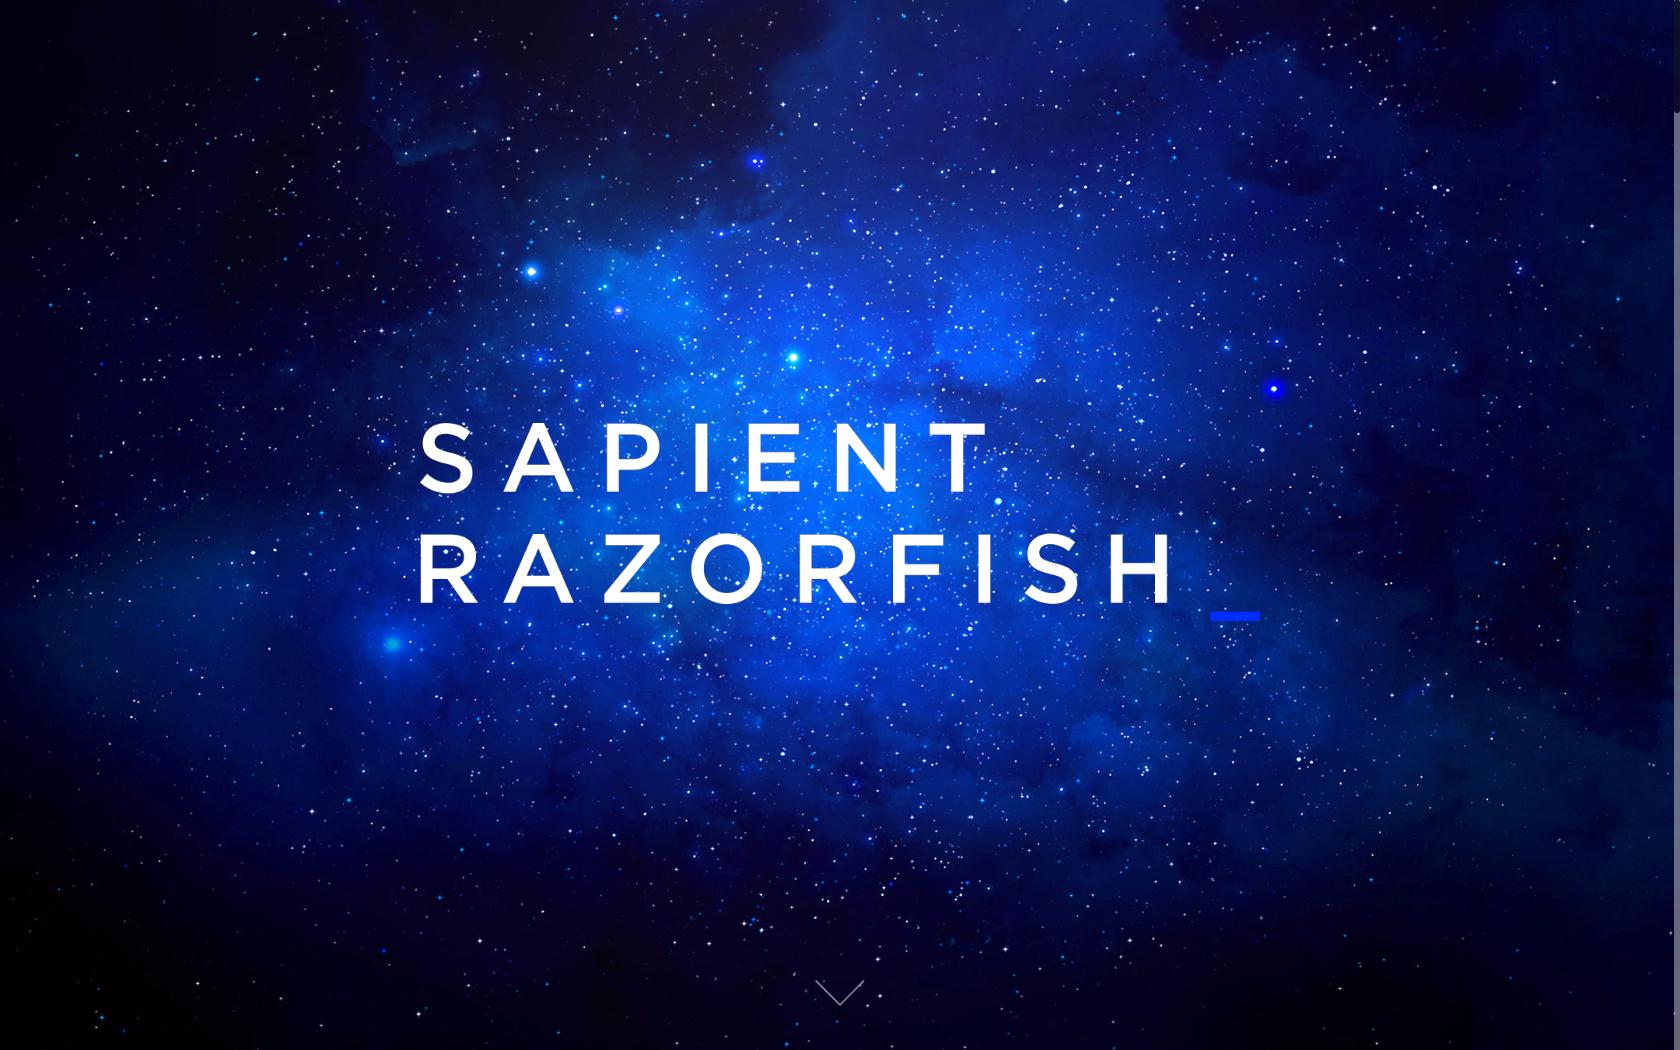 Sapientrazorfish 01